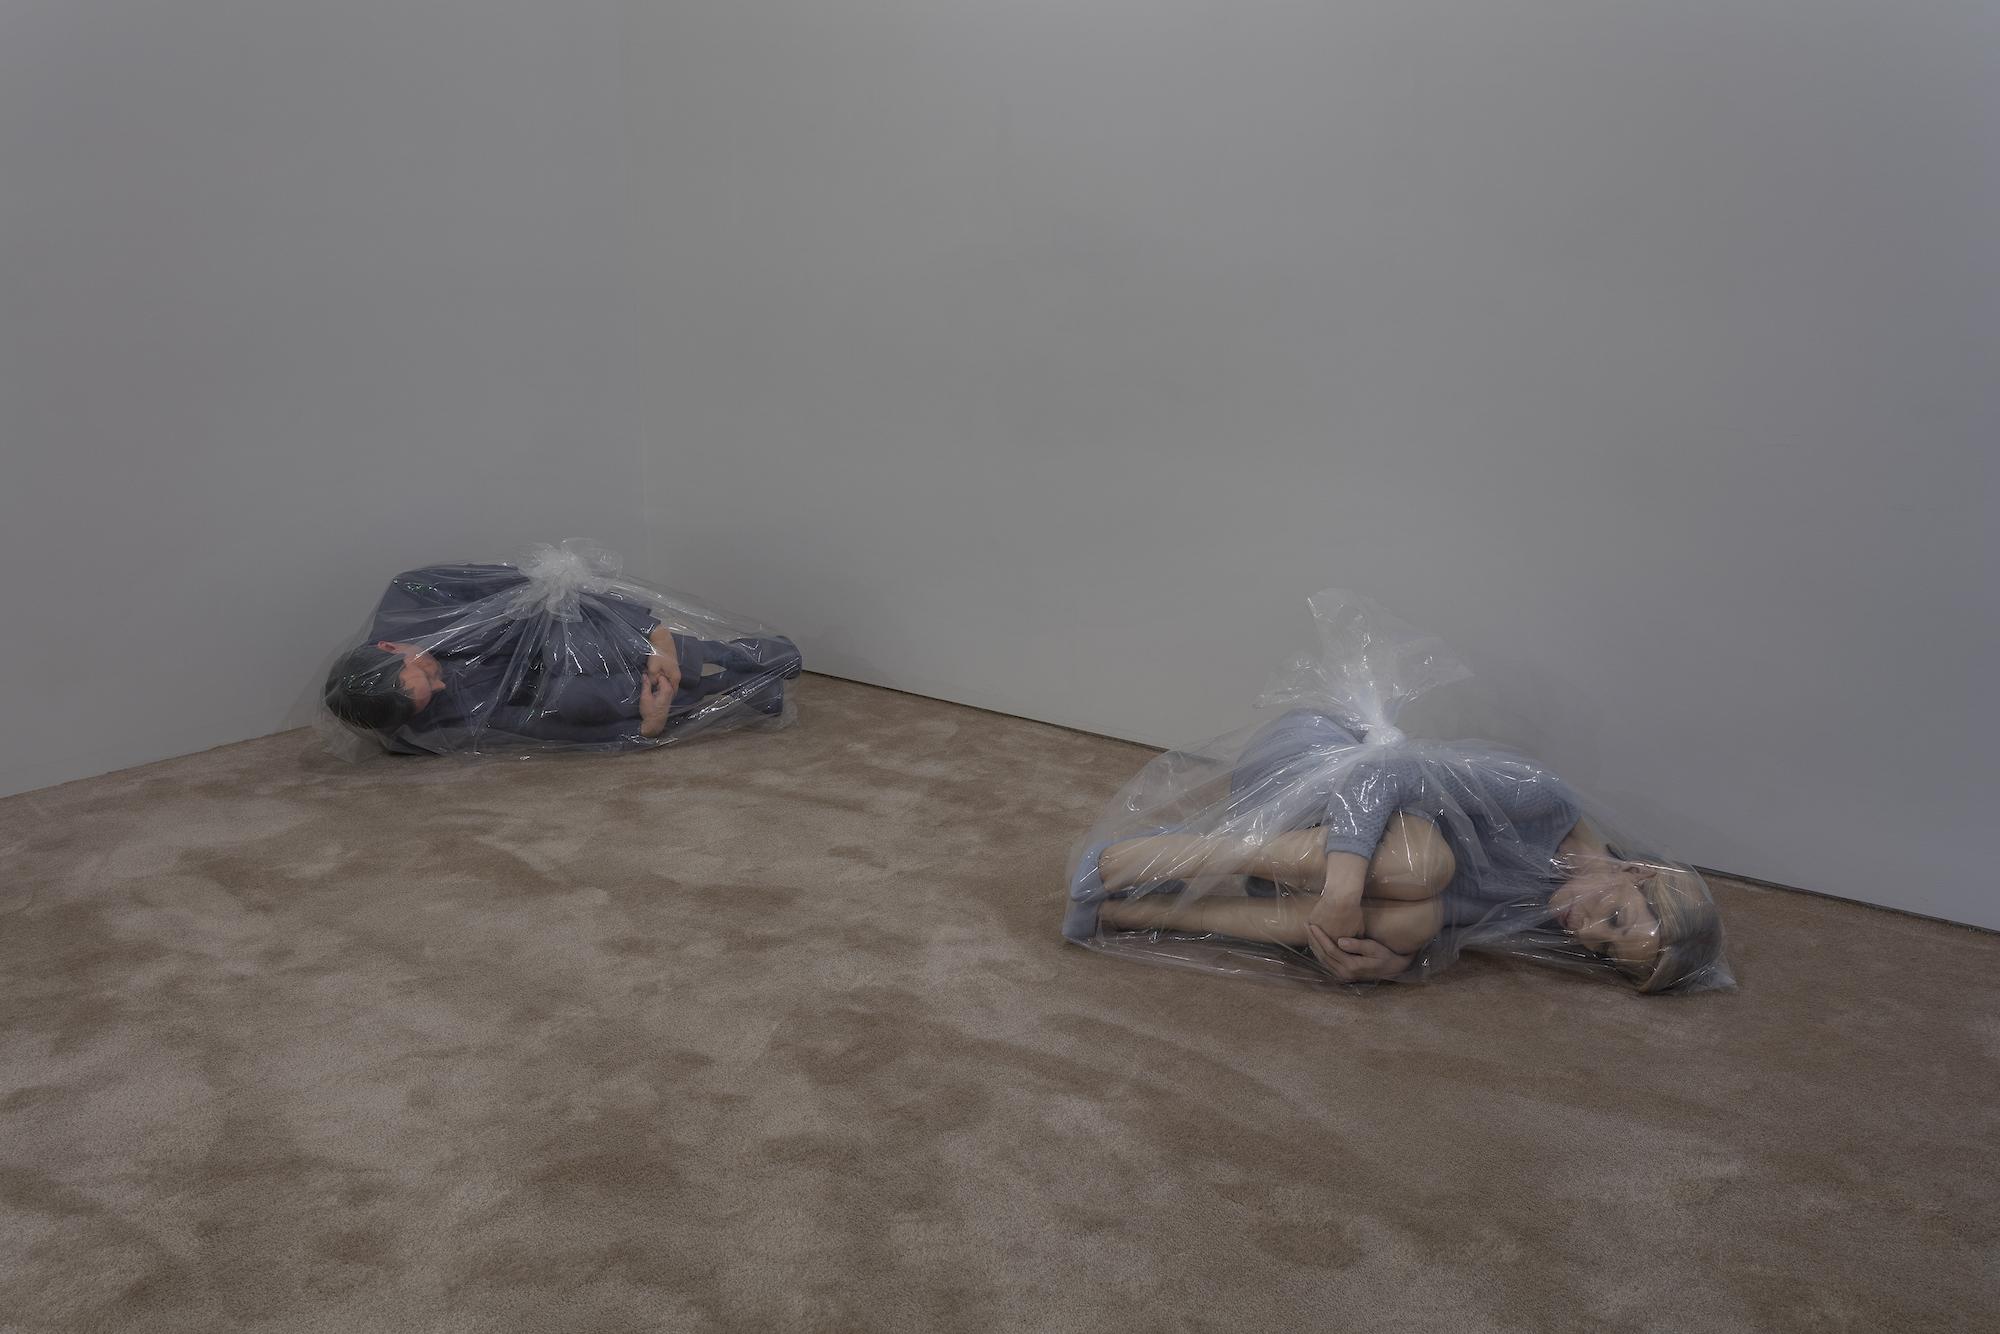 Josh Kline, Unemployment, installation view, May 3 - June 12, 2016, 47 Canal, New York, NY. © Josh Kline. Courtesy the artist, Modern Art, London & 47 Canal, New York, NY